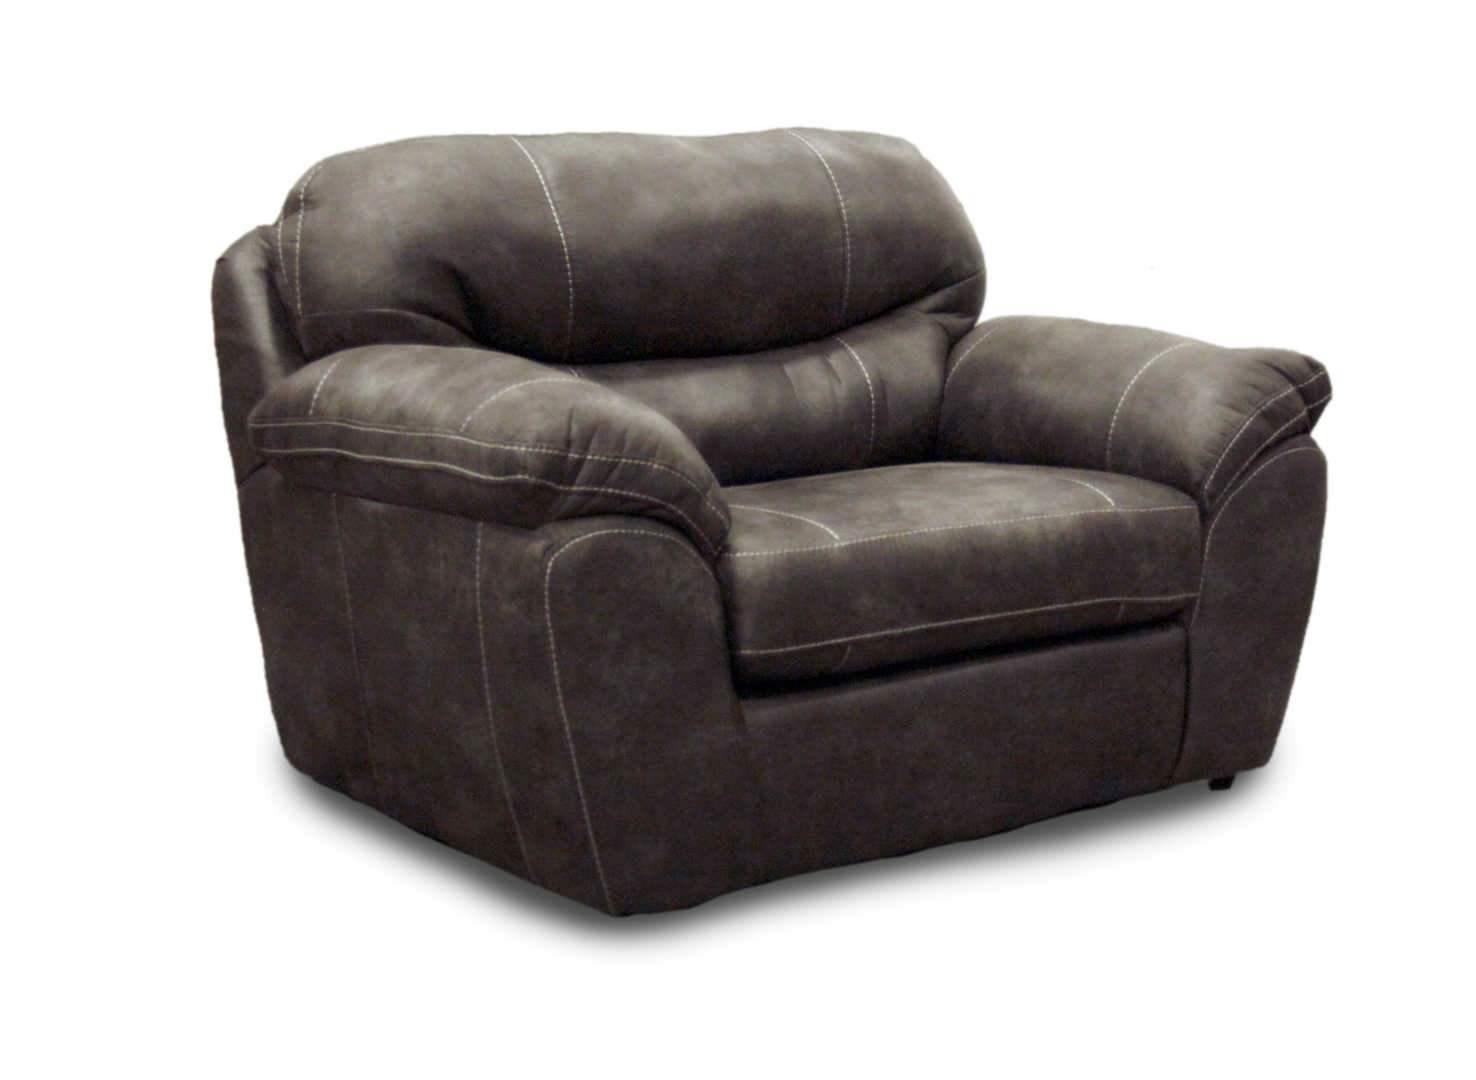 Corinthian Ulysses Charcoal Ulysses Charcoal Chair - Item Number: 18B1